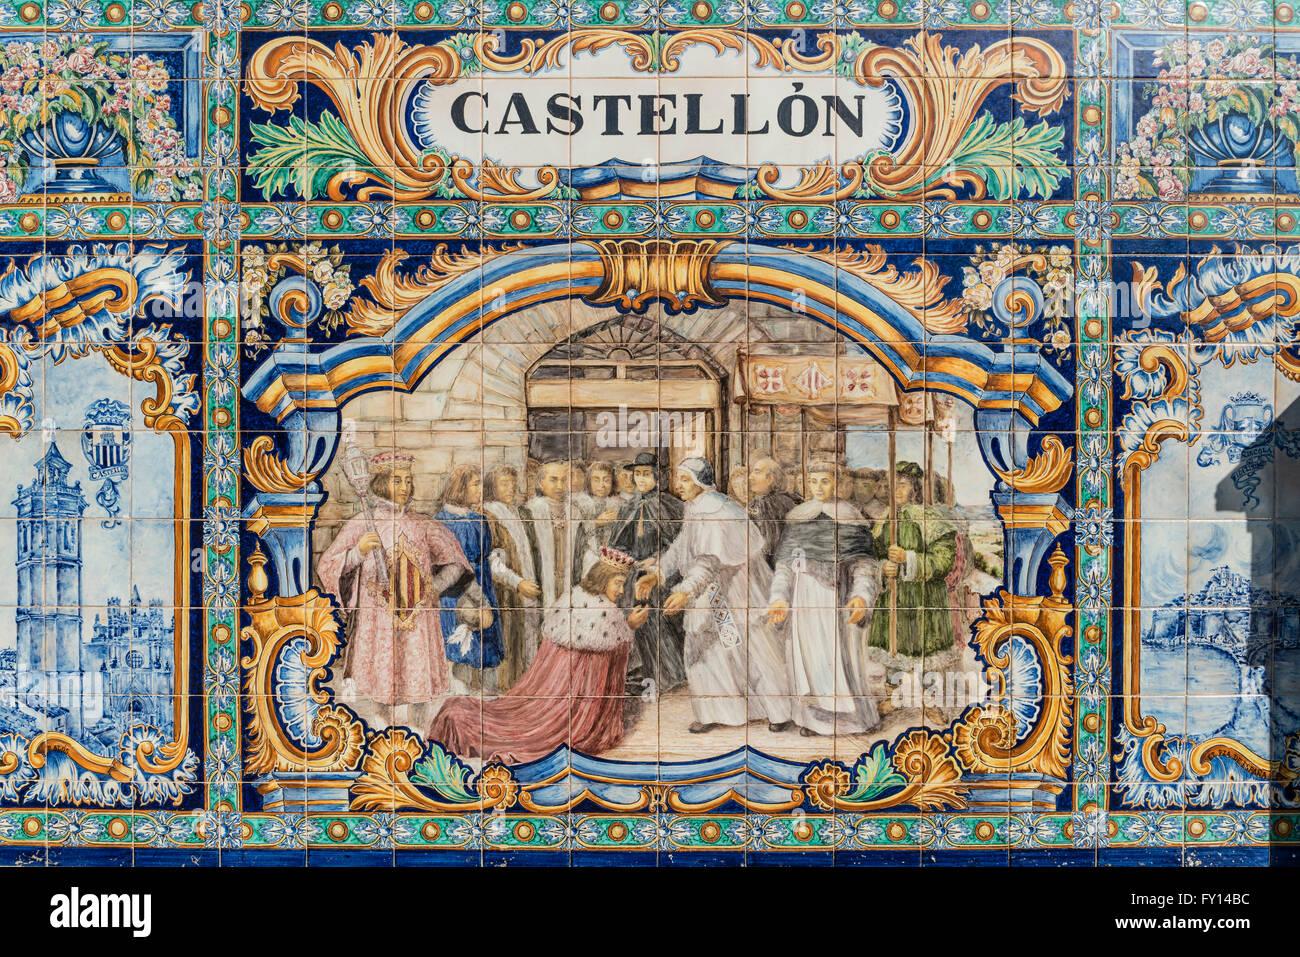 Antique ceramic, wall tiles representing provinces and cities of Spain , Castellon, Placa de Espana, spanish square, - Stock Image